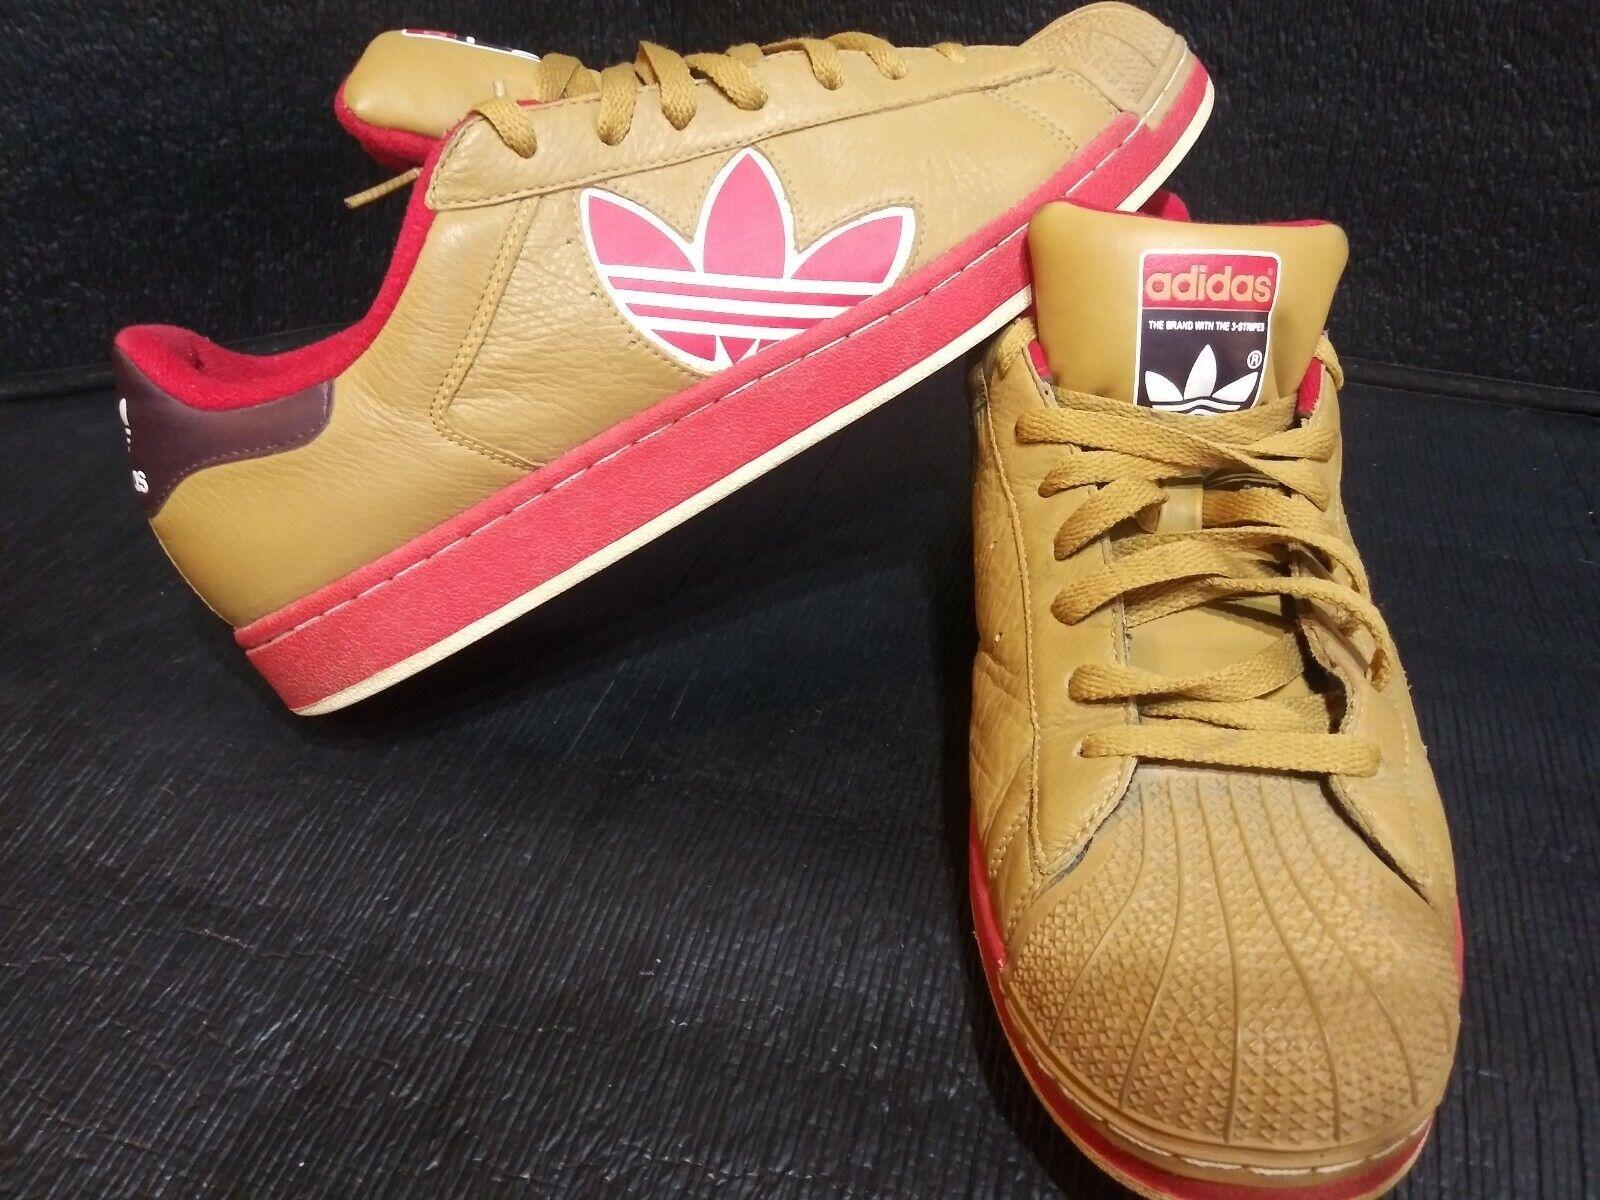 Adidas Original Superstar CB Trefoil Größe 13 rot braun Athletic schuhe Turnschuhe